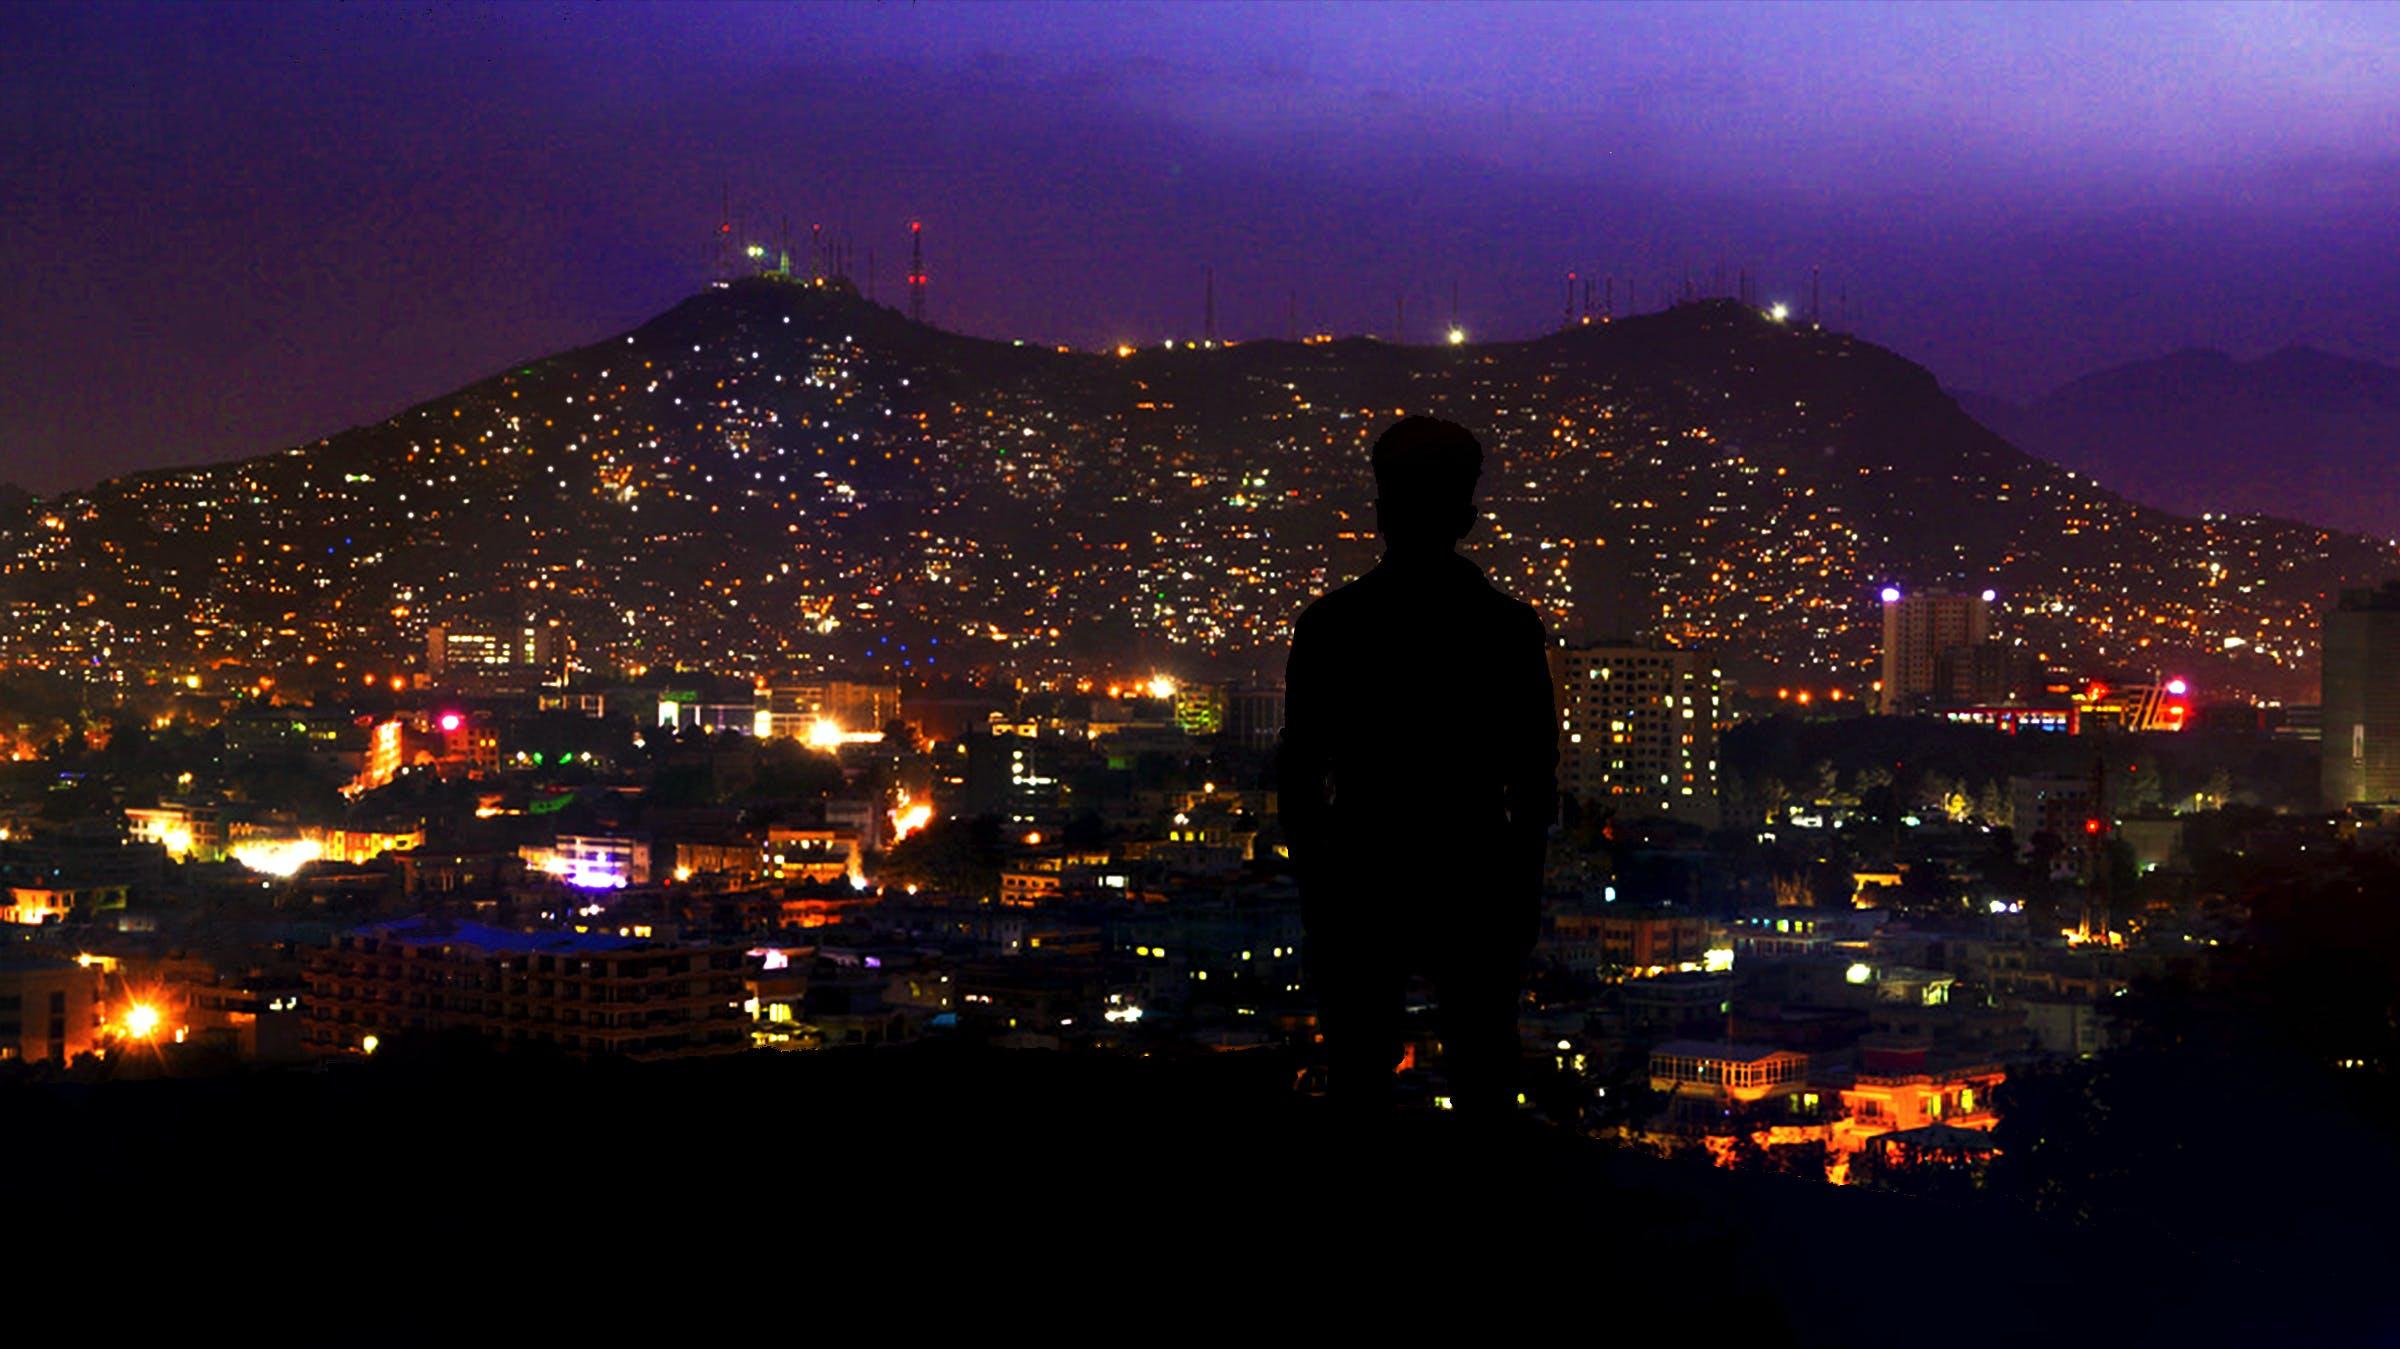 Free stock photo of Kabul City